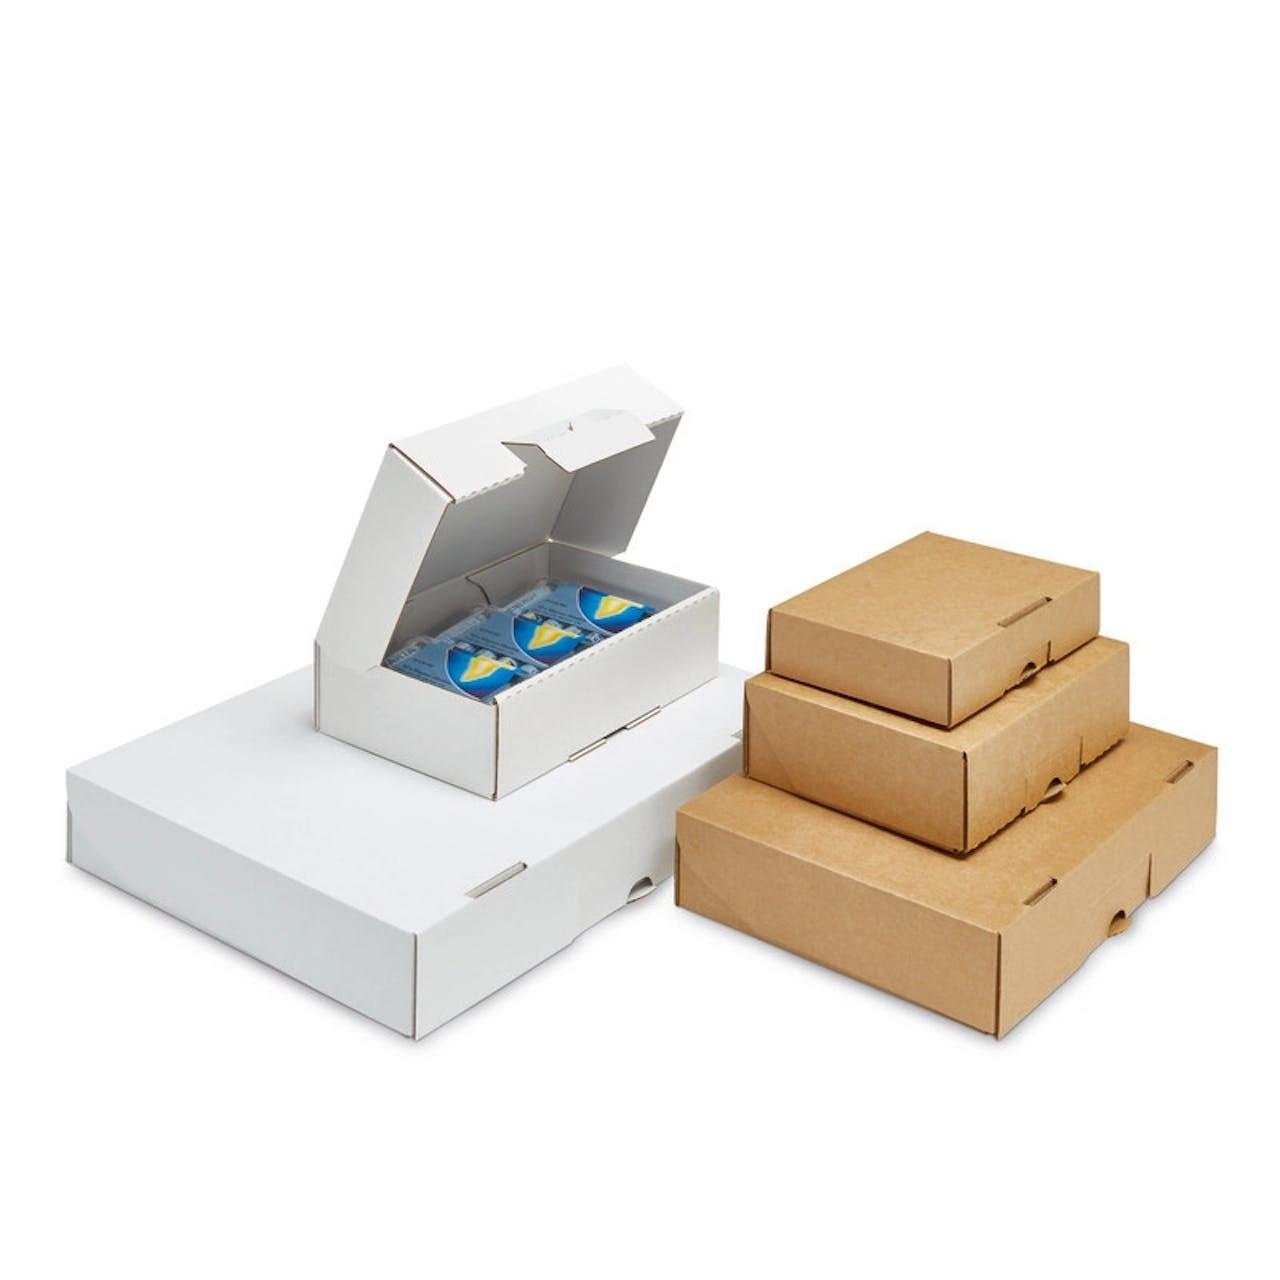 Caisse carton à rabat, Var: 569-14